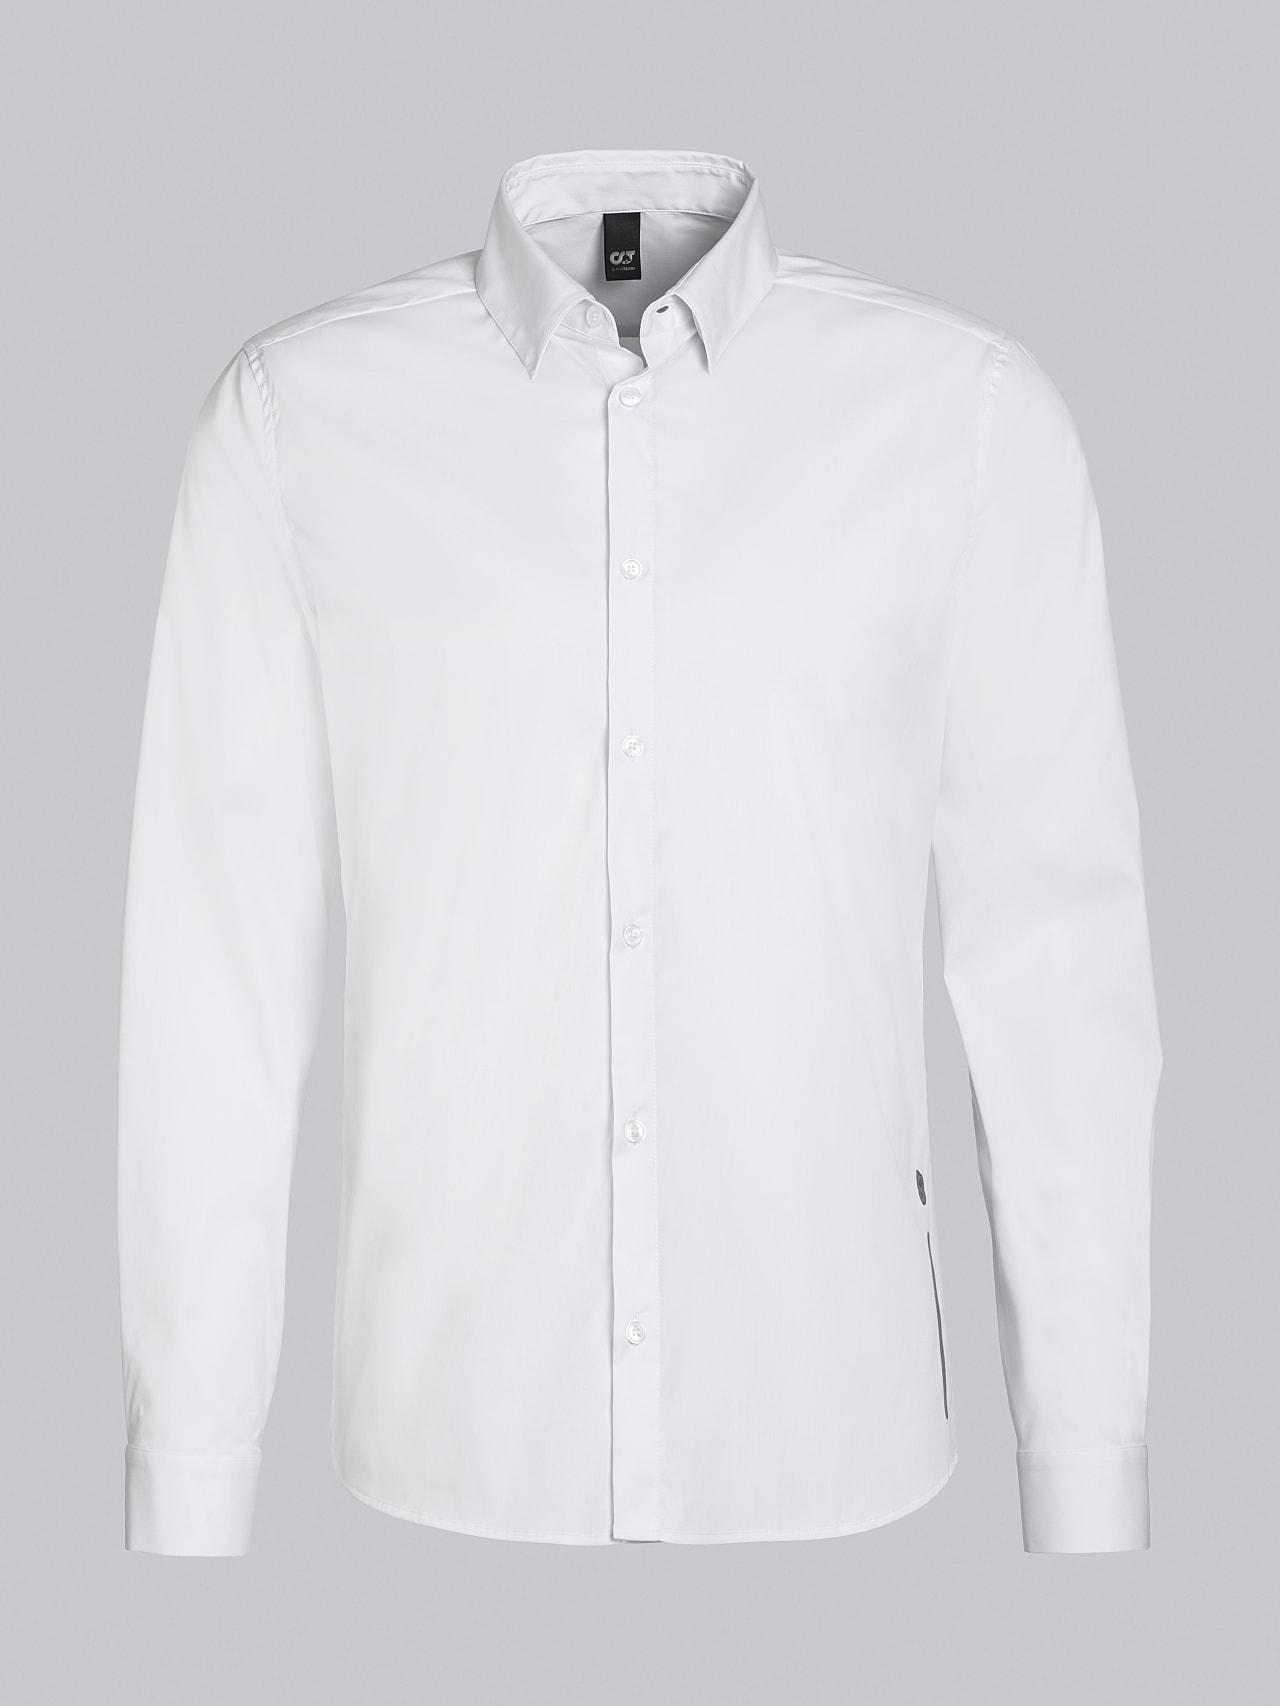 WAARG V2.Y5.02 Easy-Care Cotton Shirt white Back Alpha Tauri